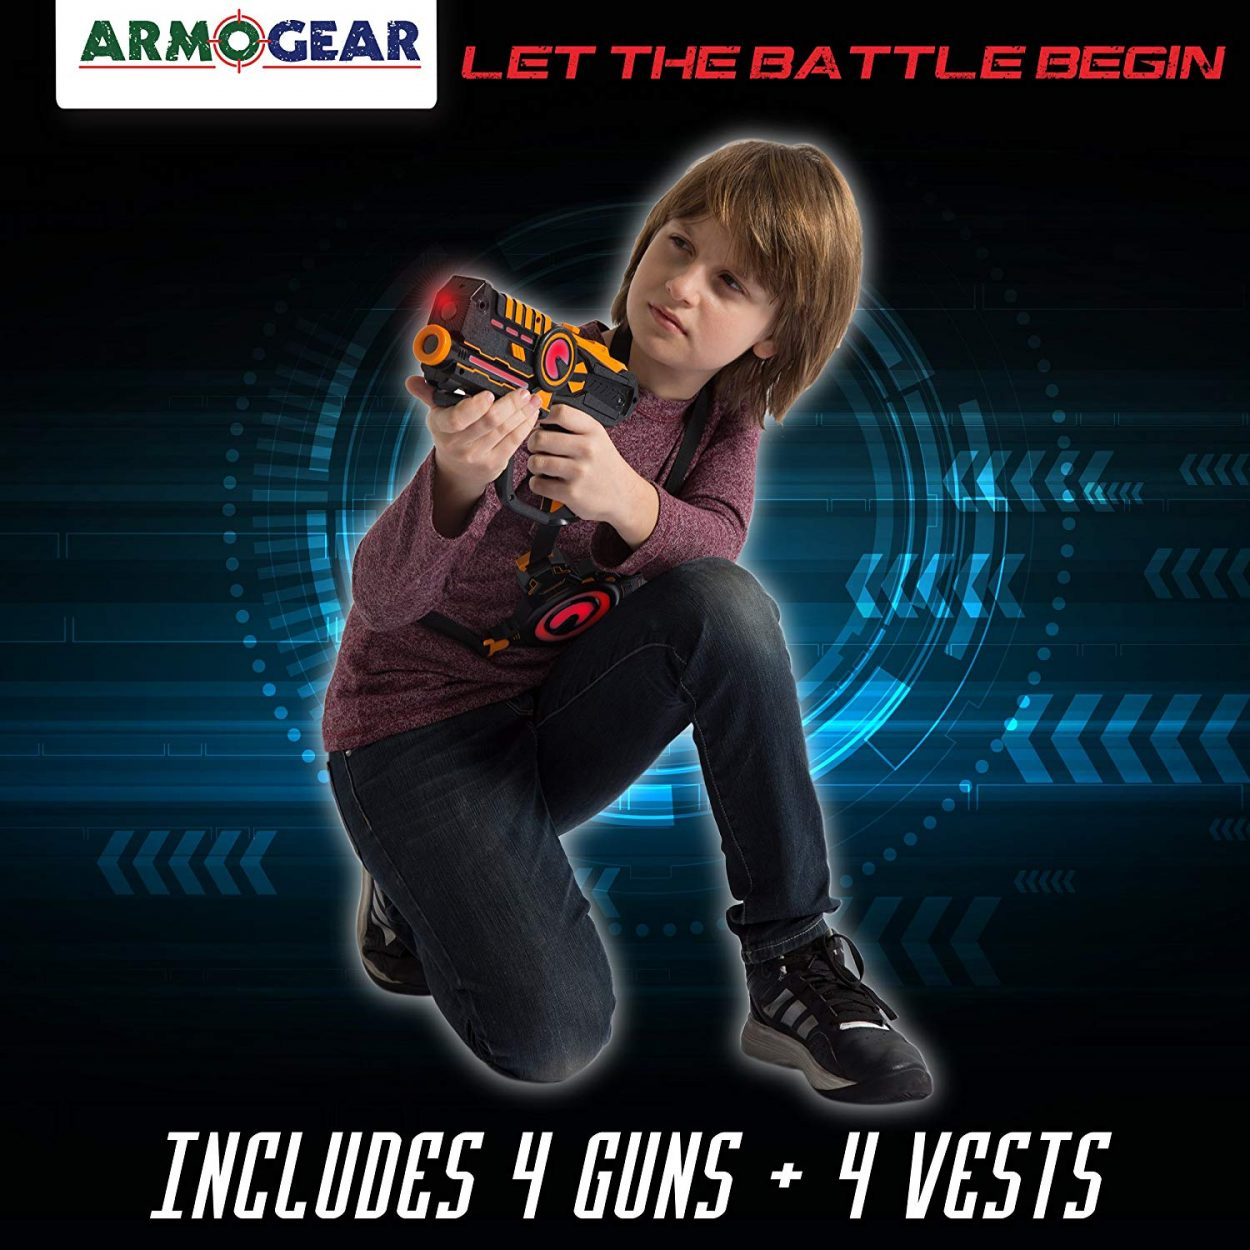 Armorgear Laser Tag Blaster & Vest Set